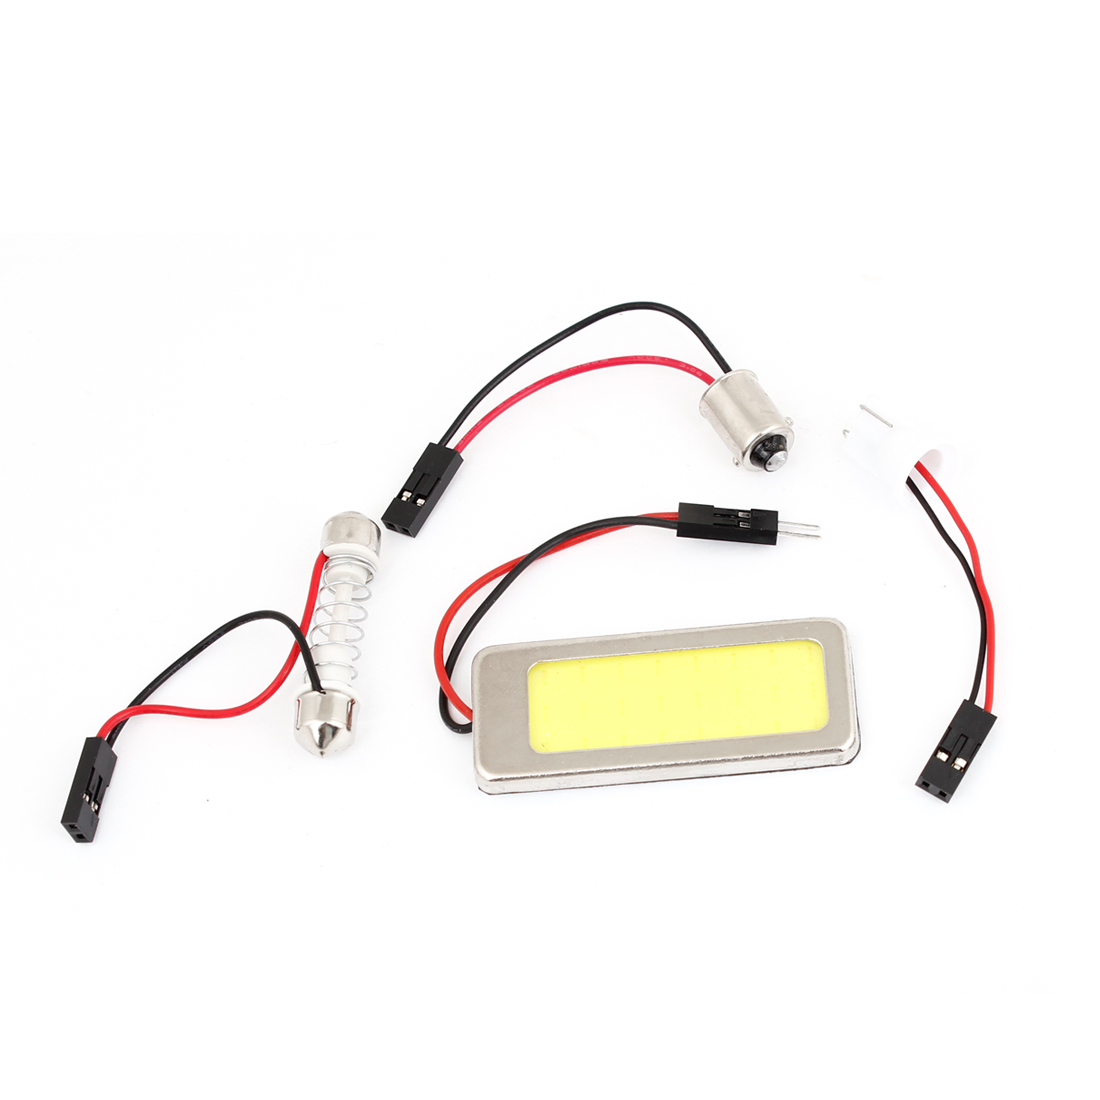 Vehicle White COB 36 LED Dome Roof Lamp Light Bulb + T10 Festoon BA9S Adapter